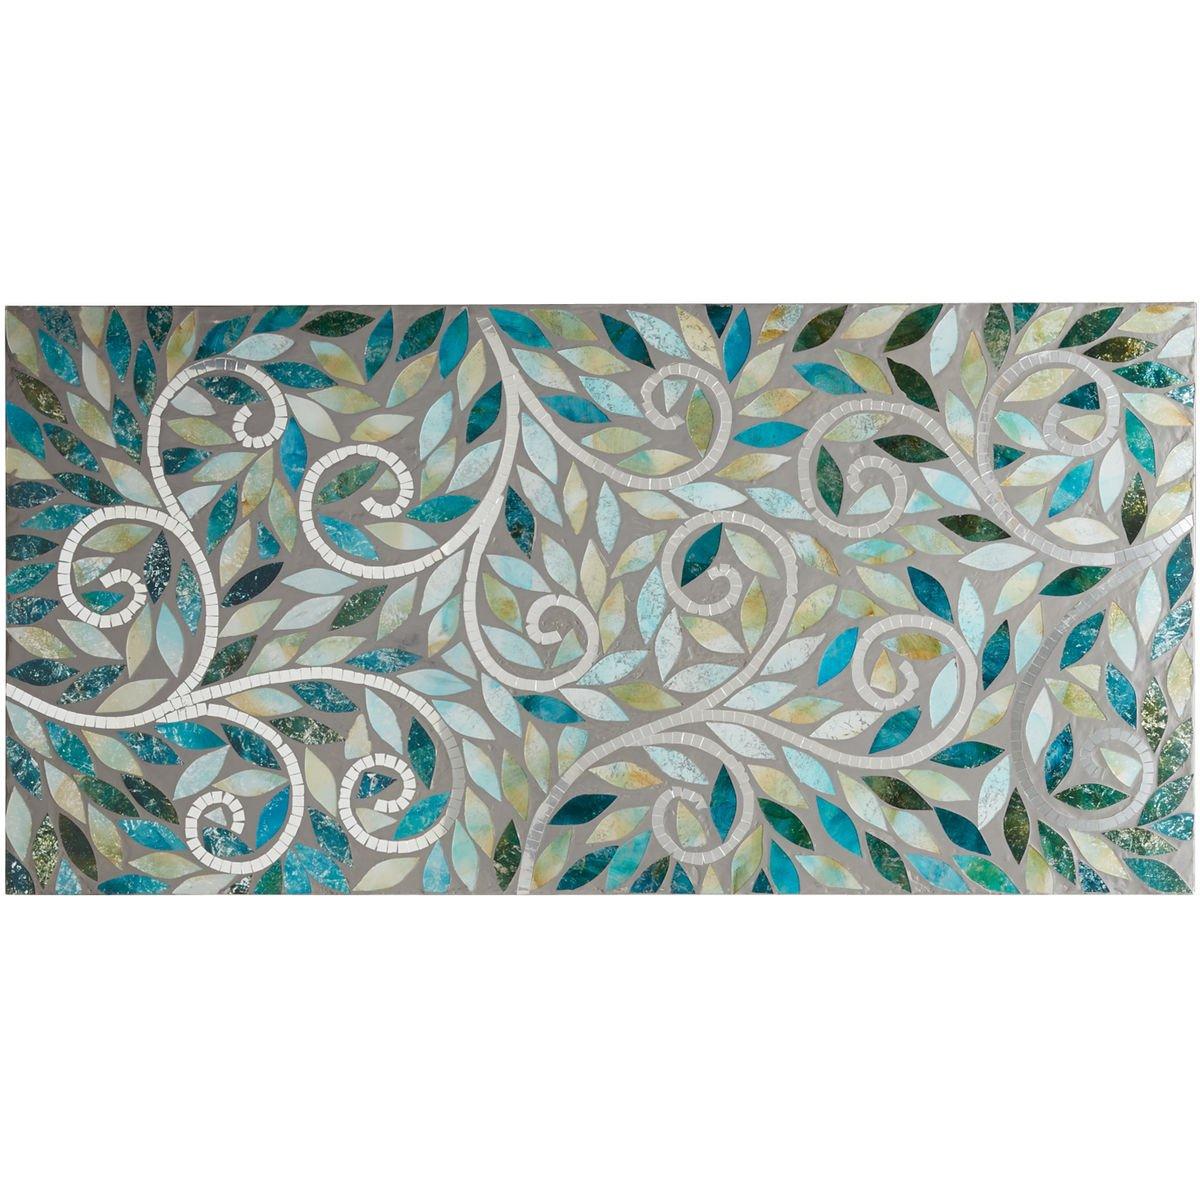 Decorativo De Pared Spa Swirls Pier 1 Imports   SEARS.COM.MX - Me ...